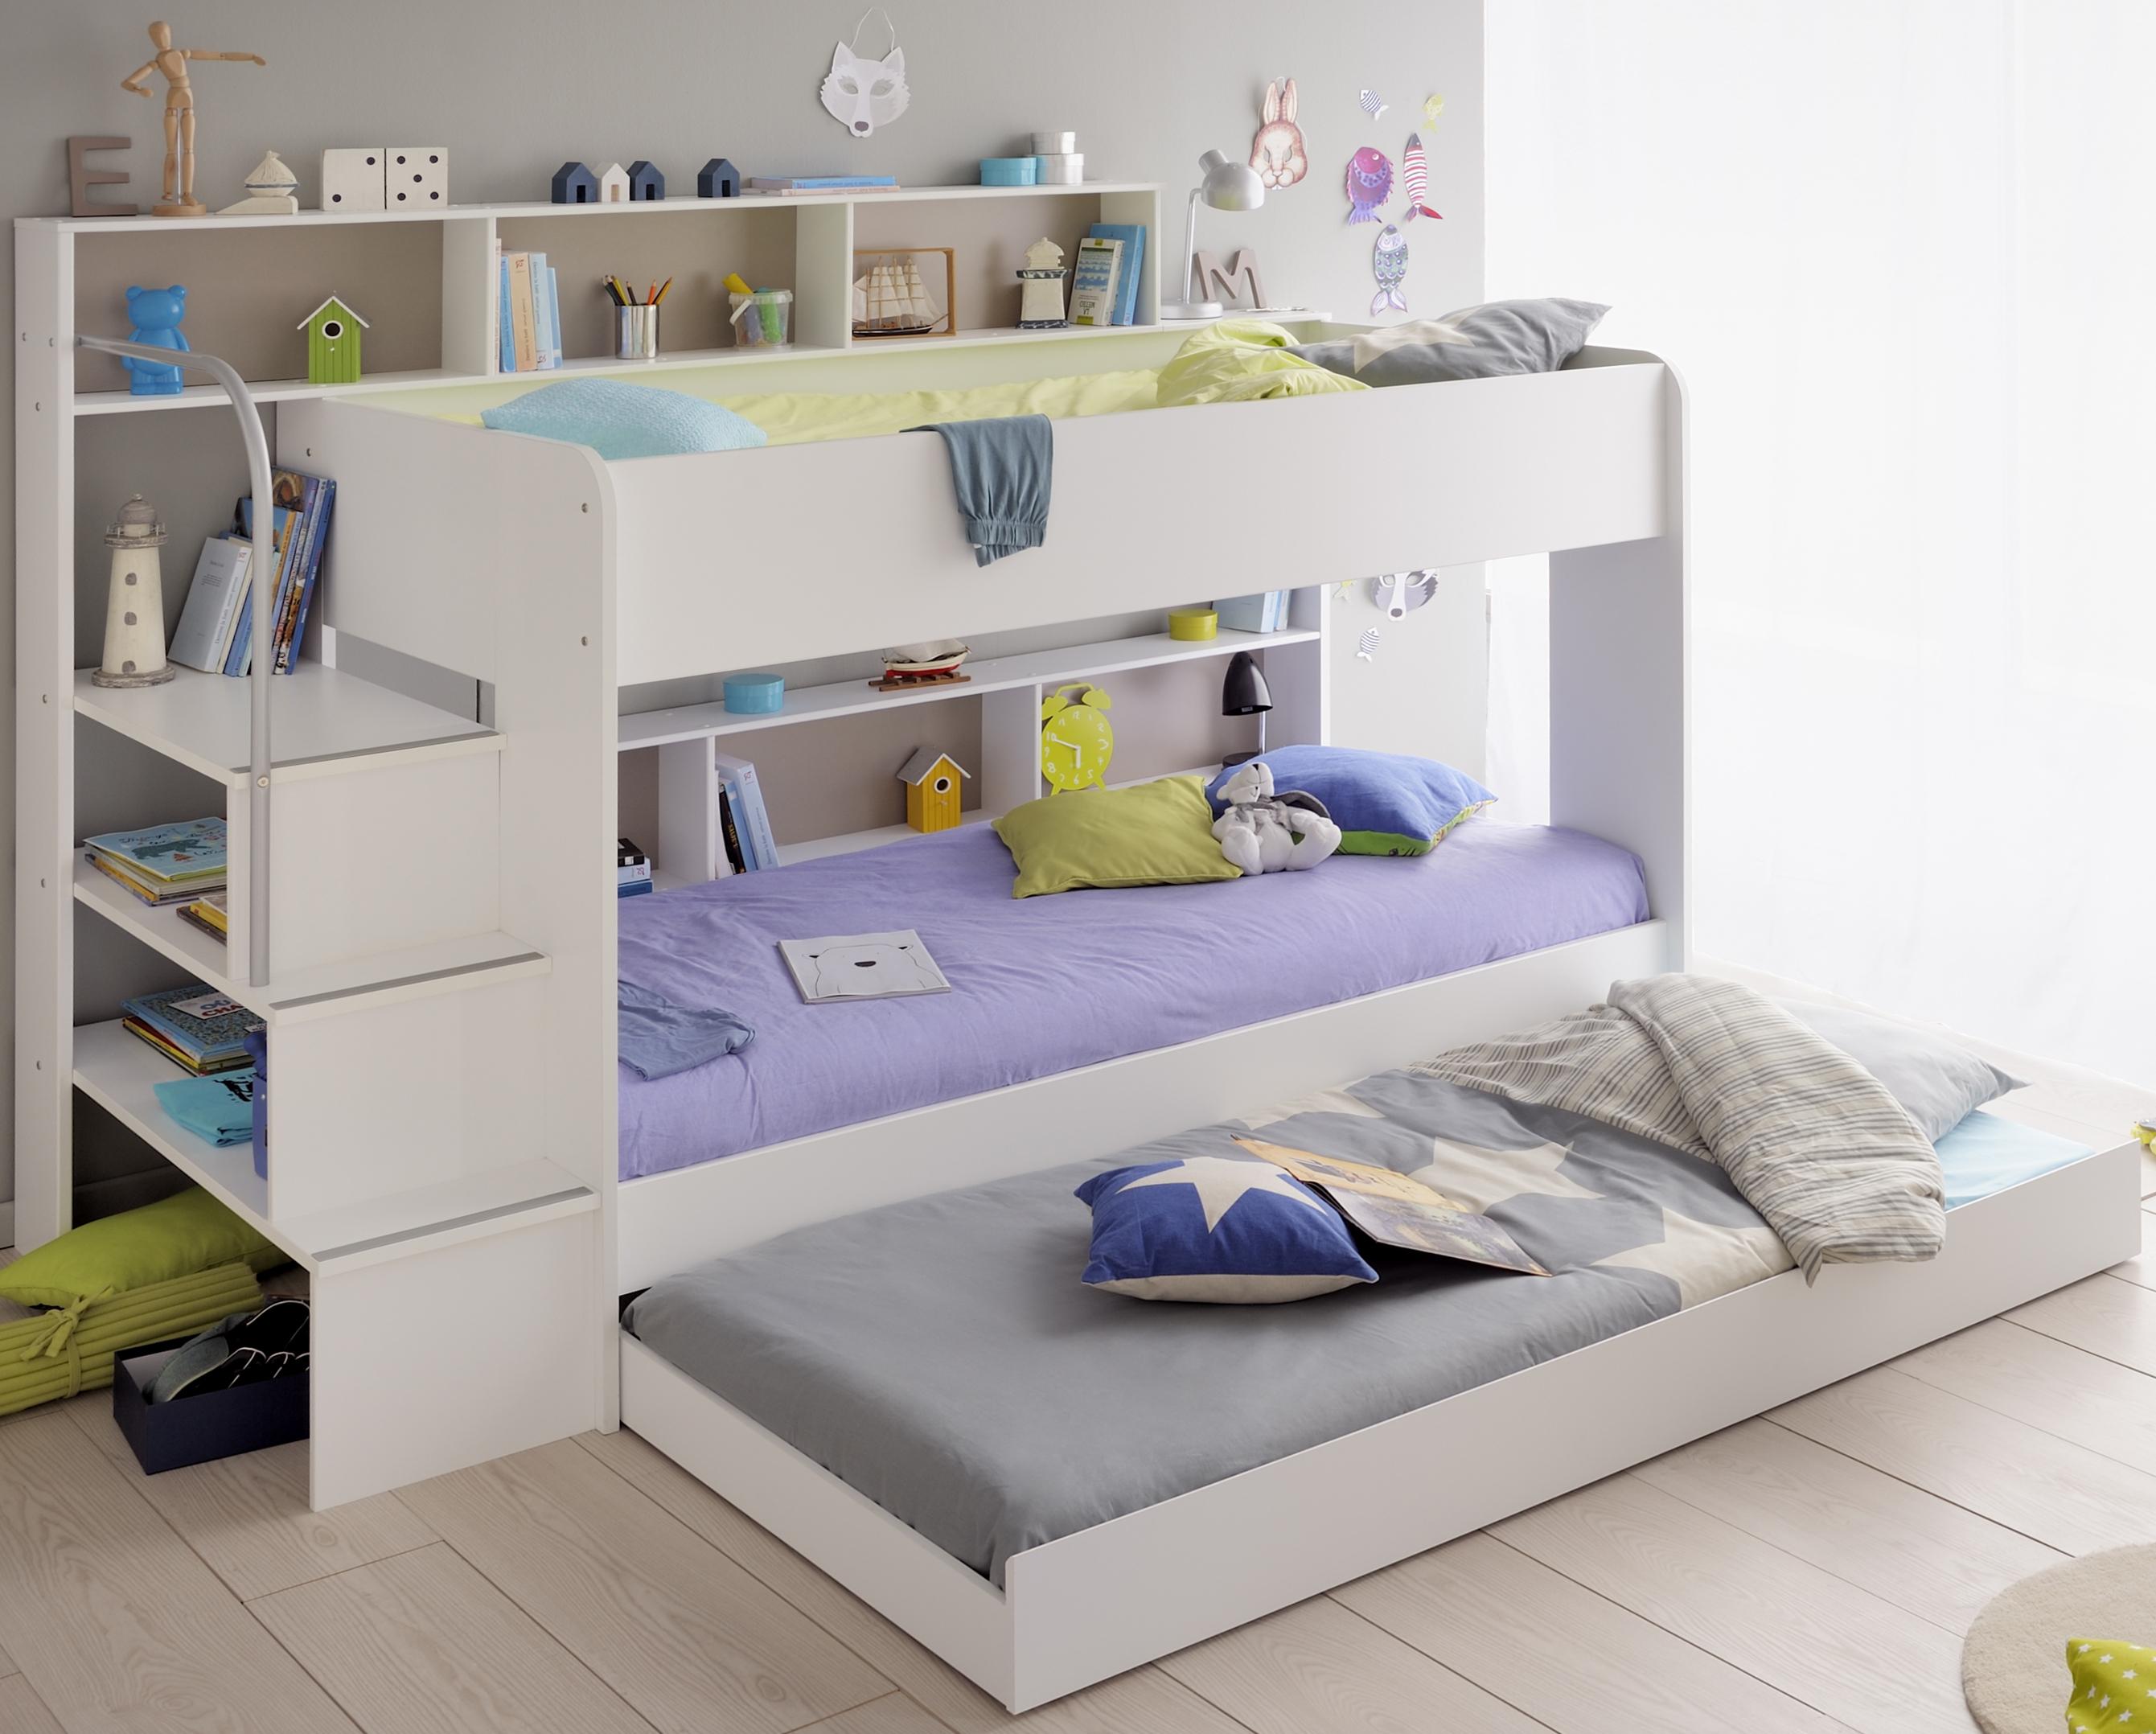 Etagenbett Kinder 140x200 : Parisot etagenbett bibob parimöbel